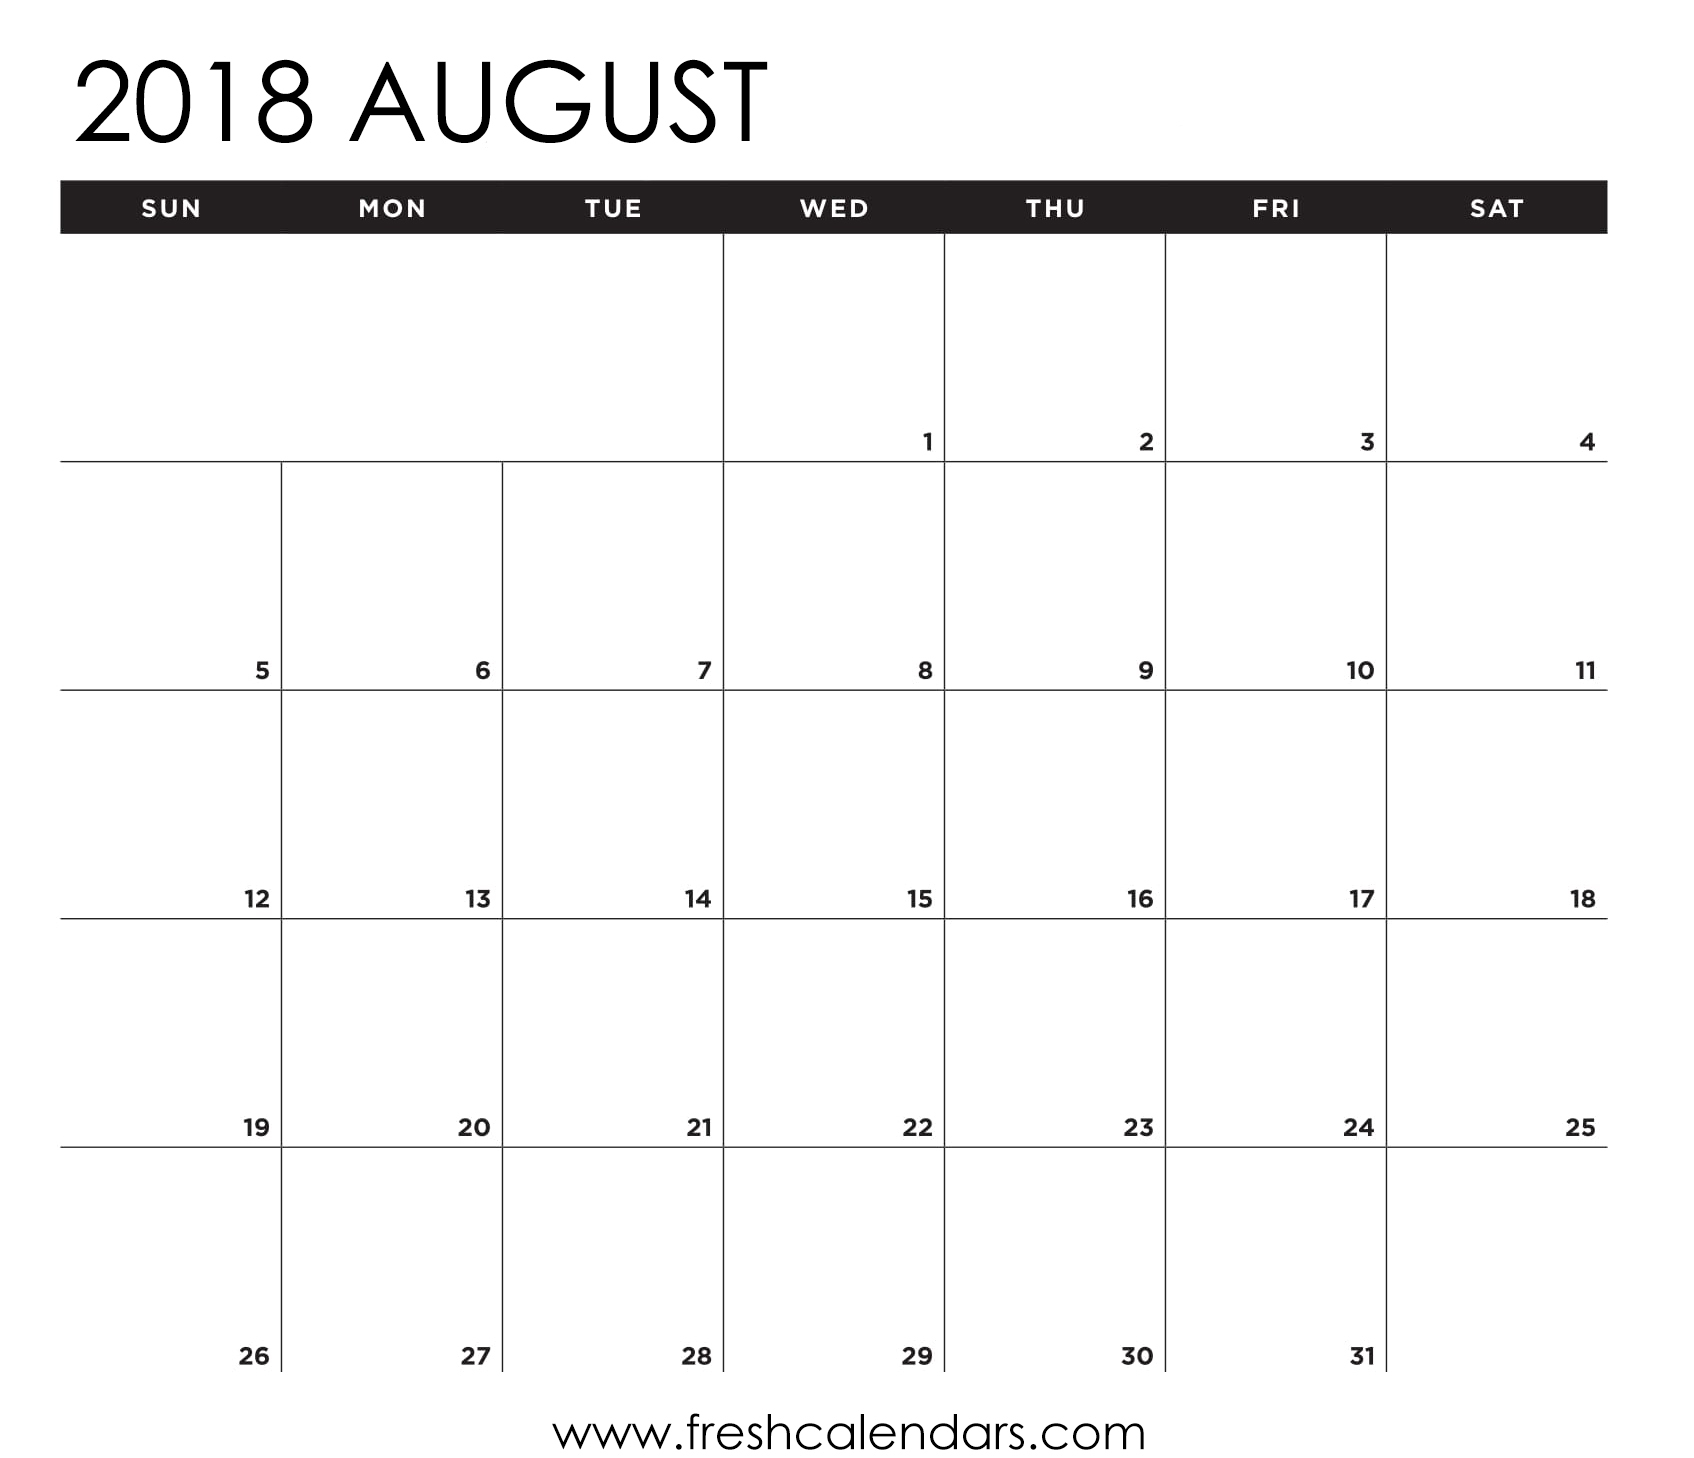 August 2018 Calendar Printable - Fresh Calendars in August Blank Calendar Printable